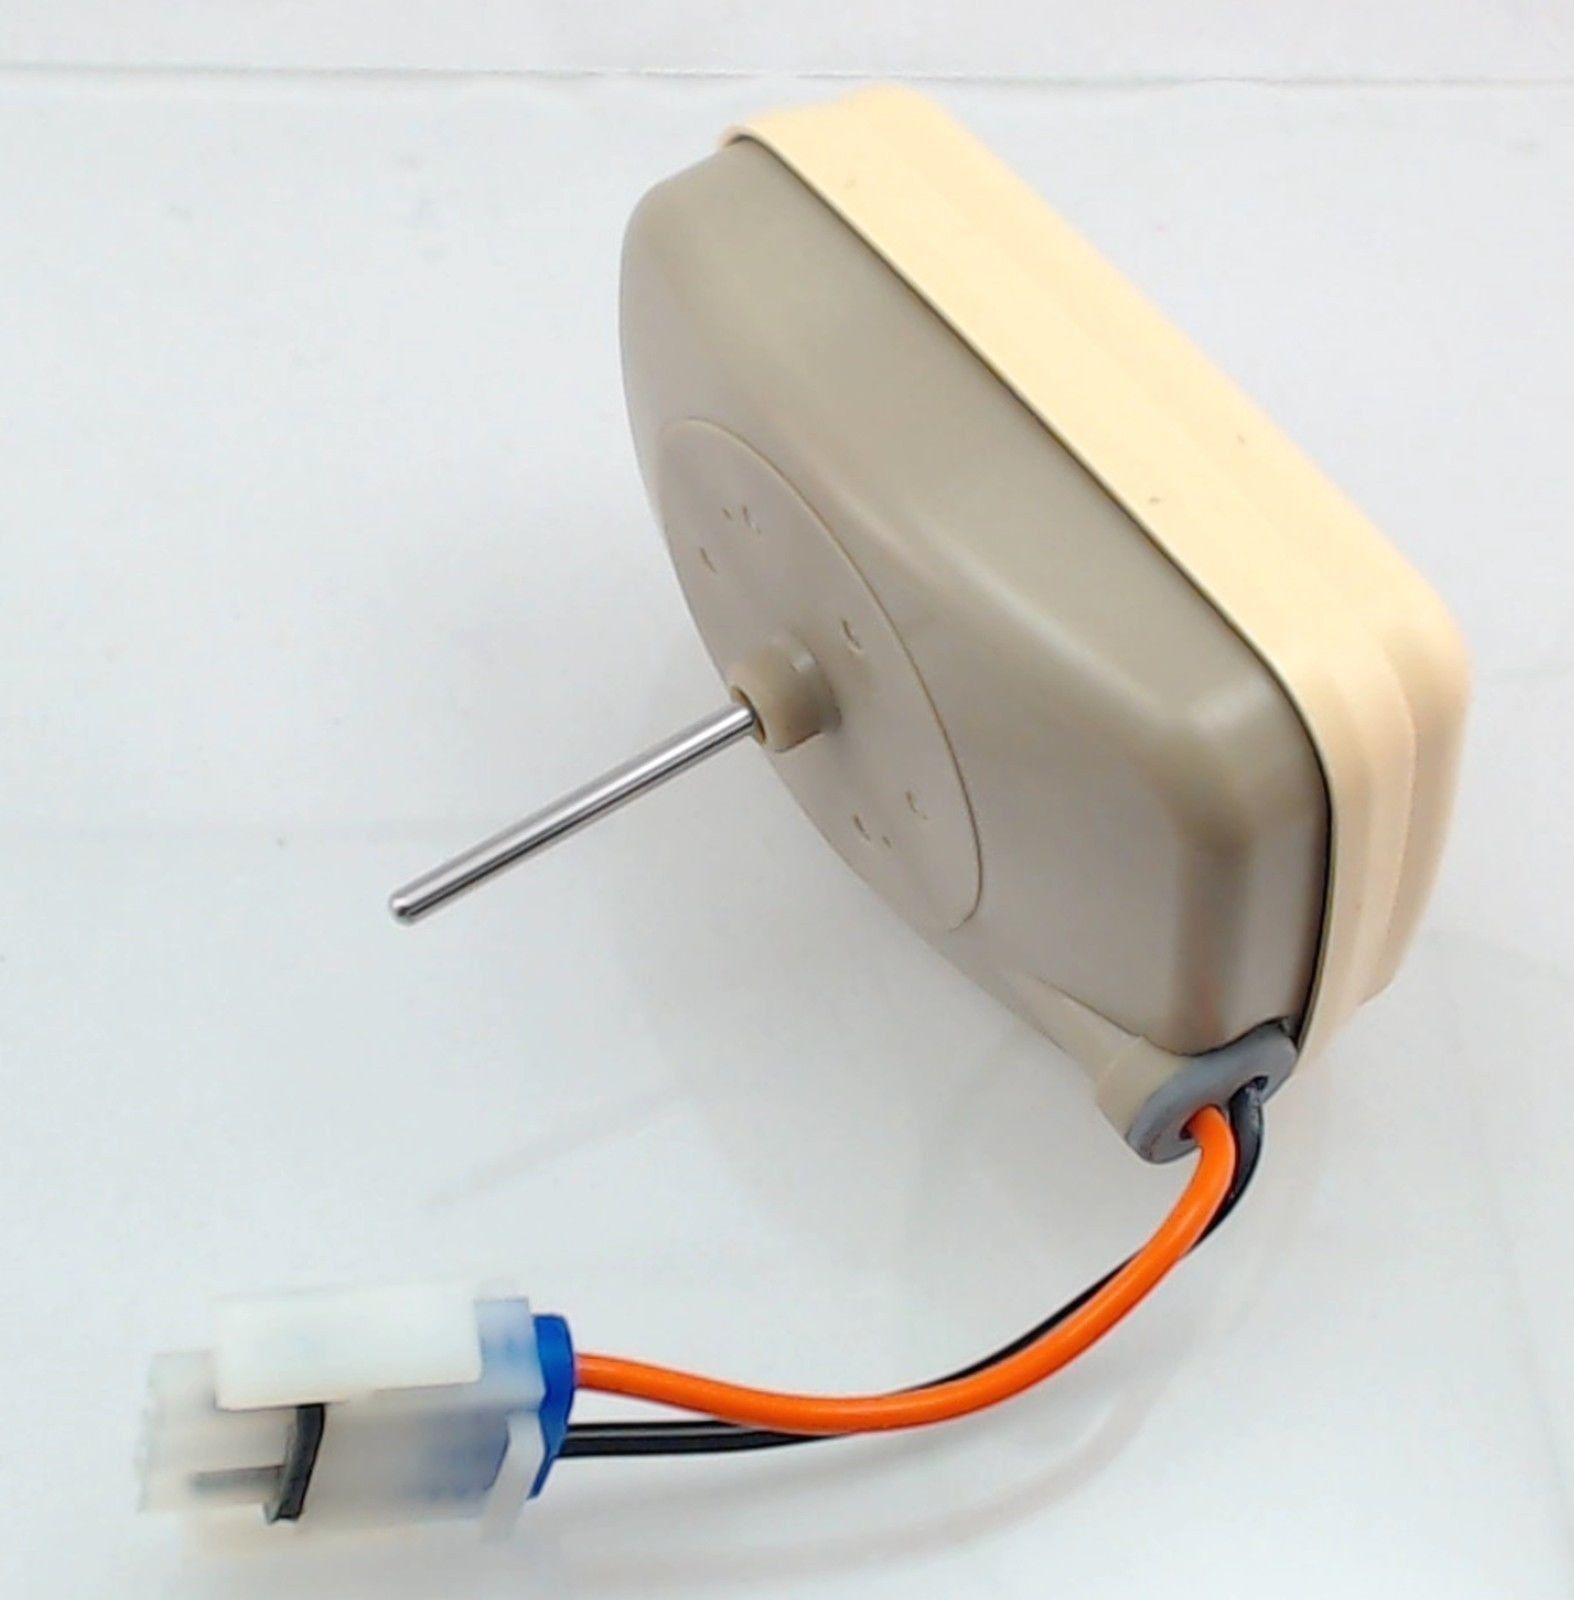 Refrigerator Evaporator Fan Motor that works with GE GTE15CTHCRBB